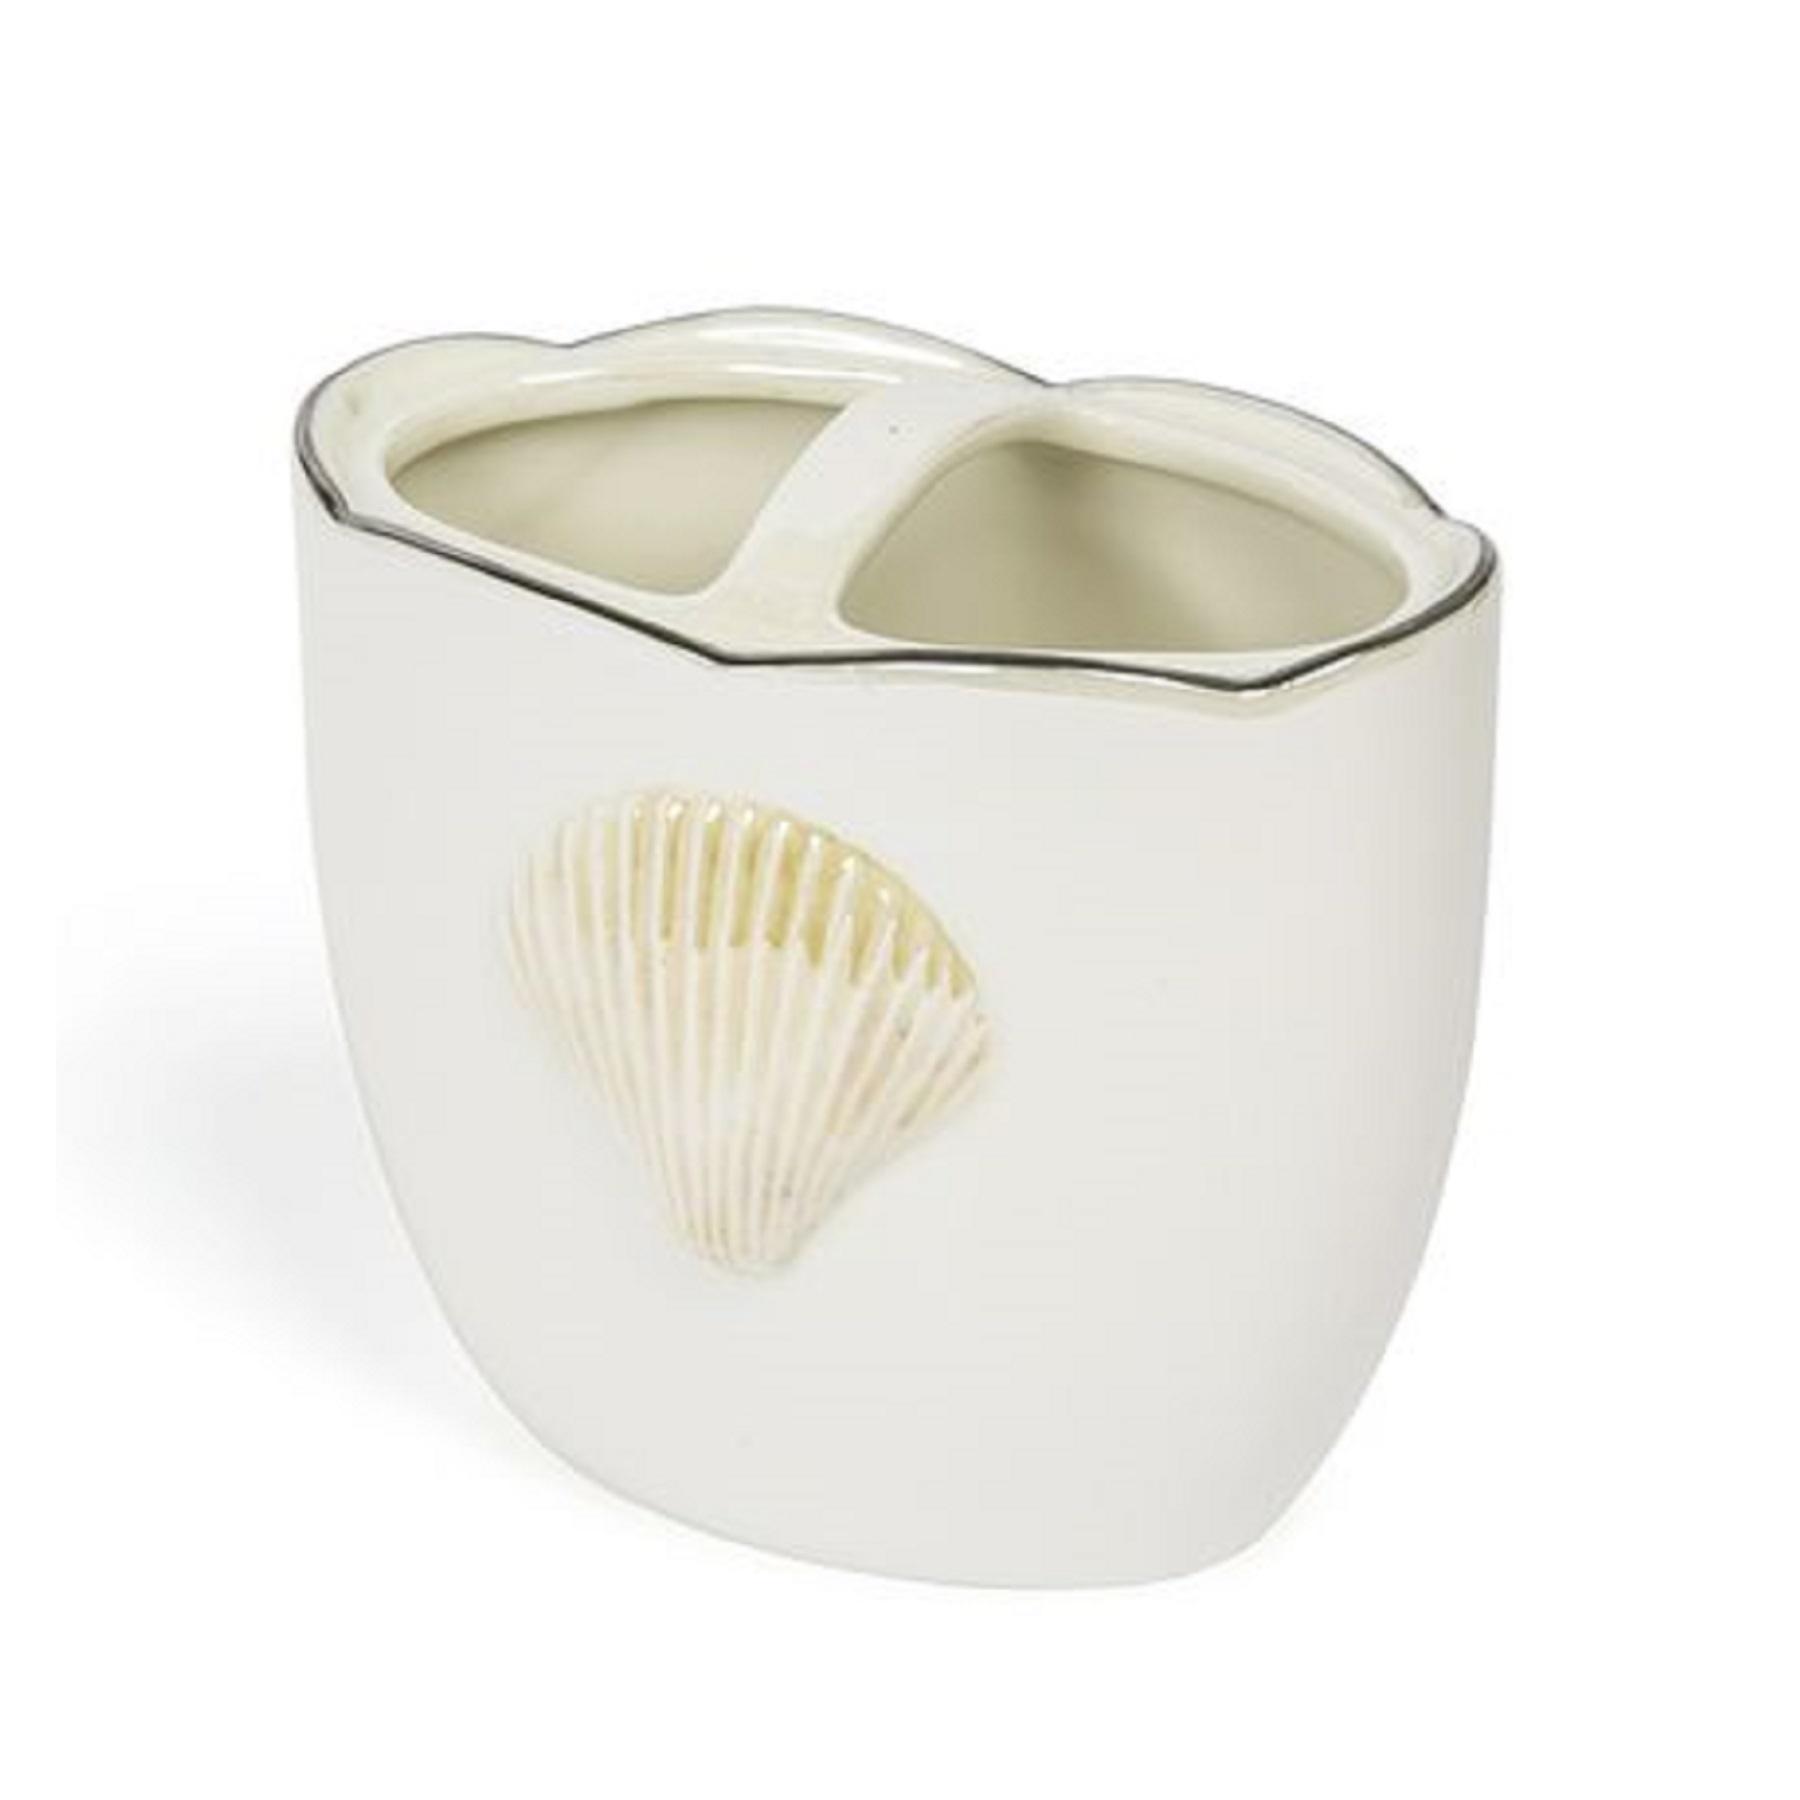 Стаканы для зубных щеток Стакан для зубных щёток Kassatex Mare Shells Pearl stakan-dlya-zubnih-shyotok-mare-shells-pearl-ot-kassatex-ssha-kitay-vid-sboku.jpg